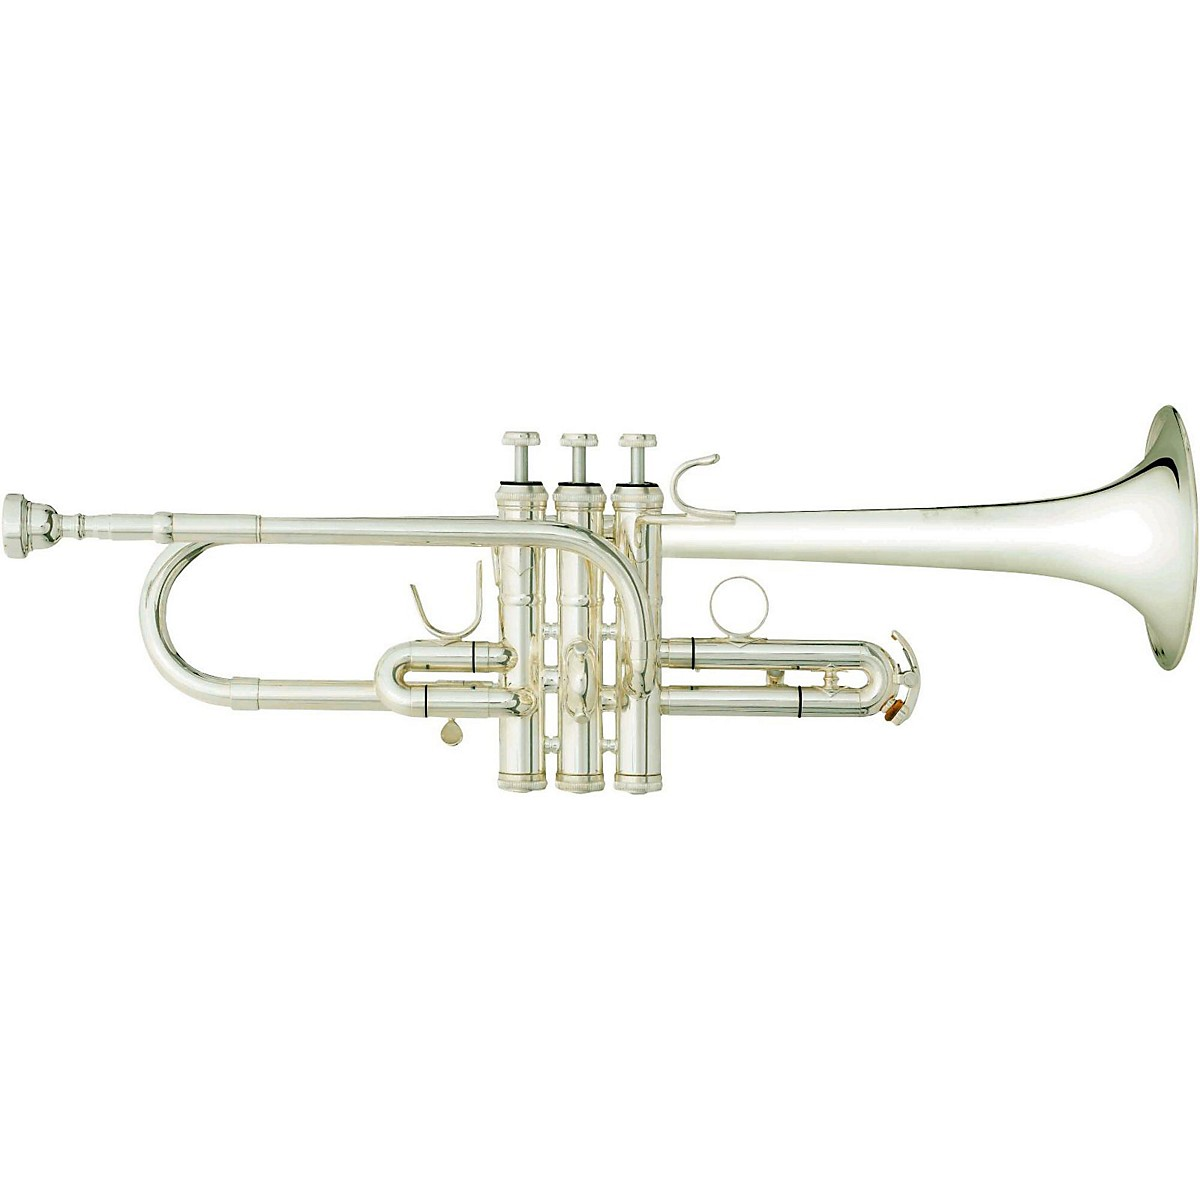 B&S EXE Artist Signature X-Series Eb Trumpet